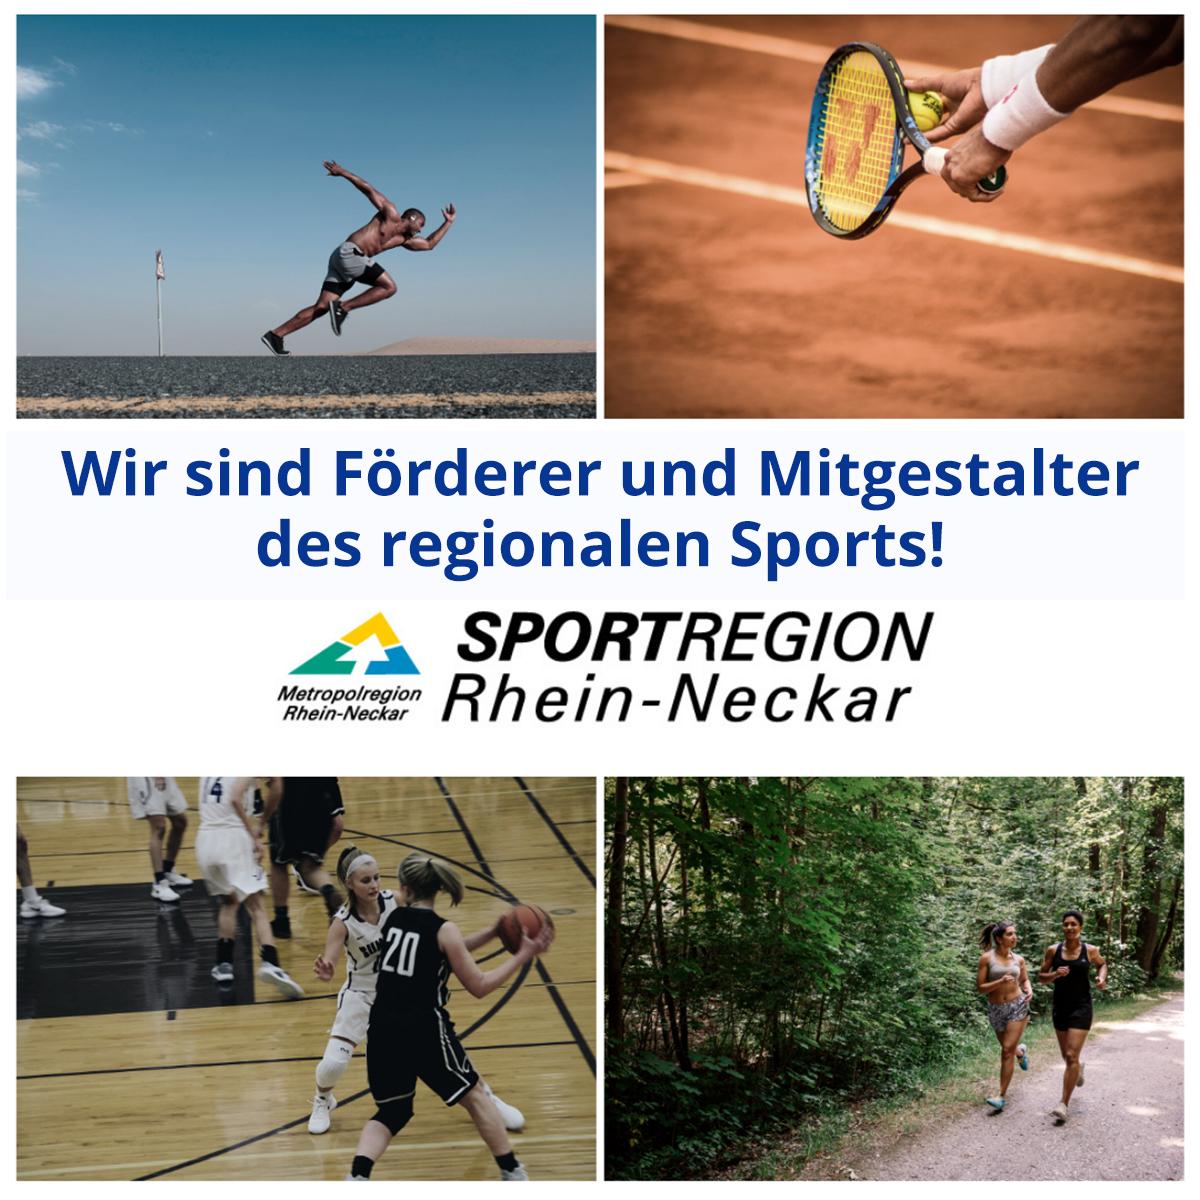 Pfenning logsitics Sponsor der Sportregion Rhein-Neckar